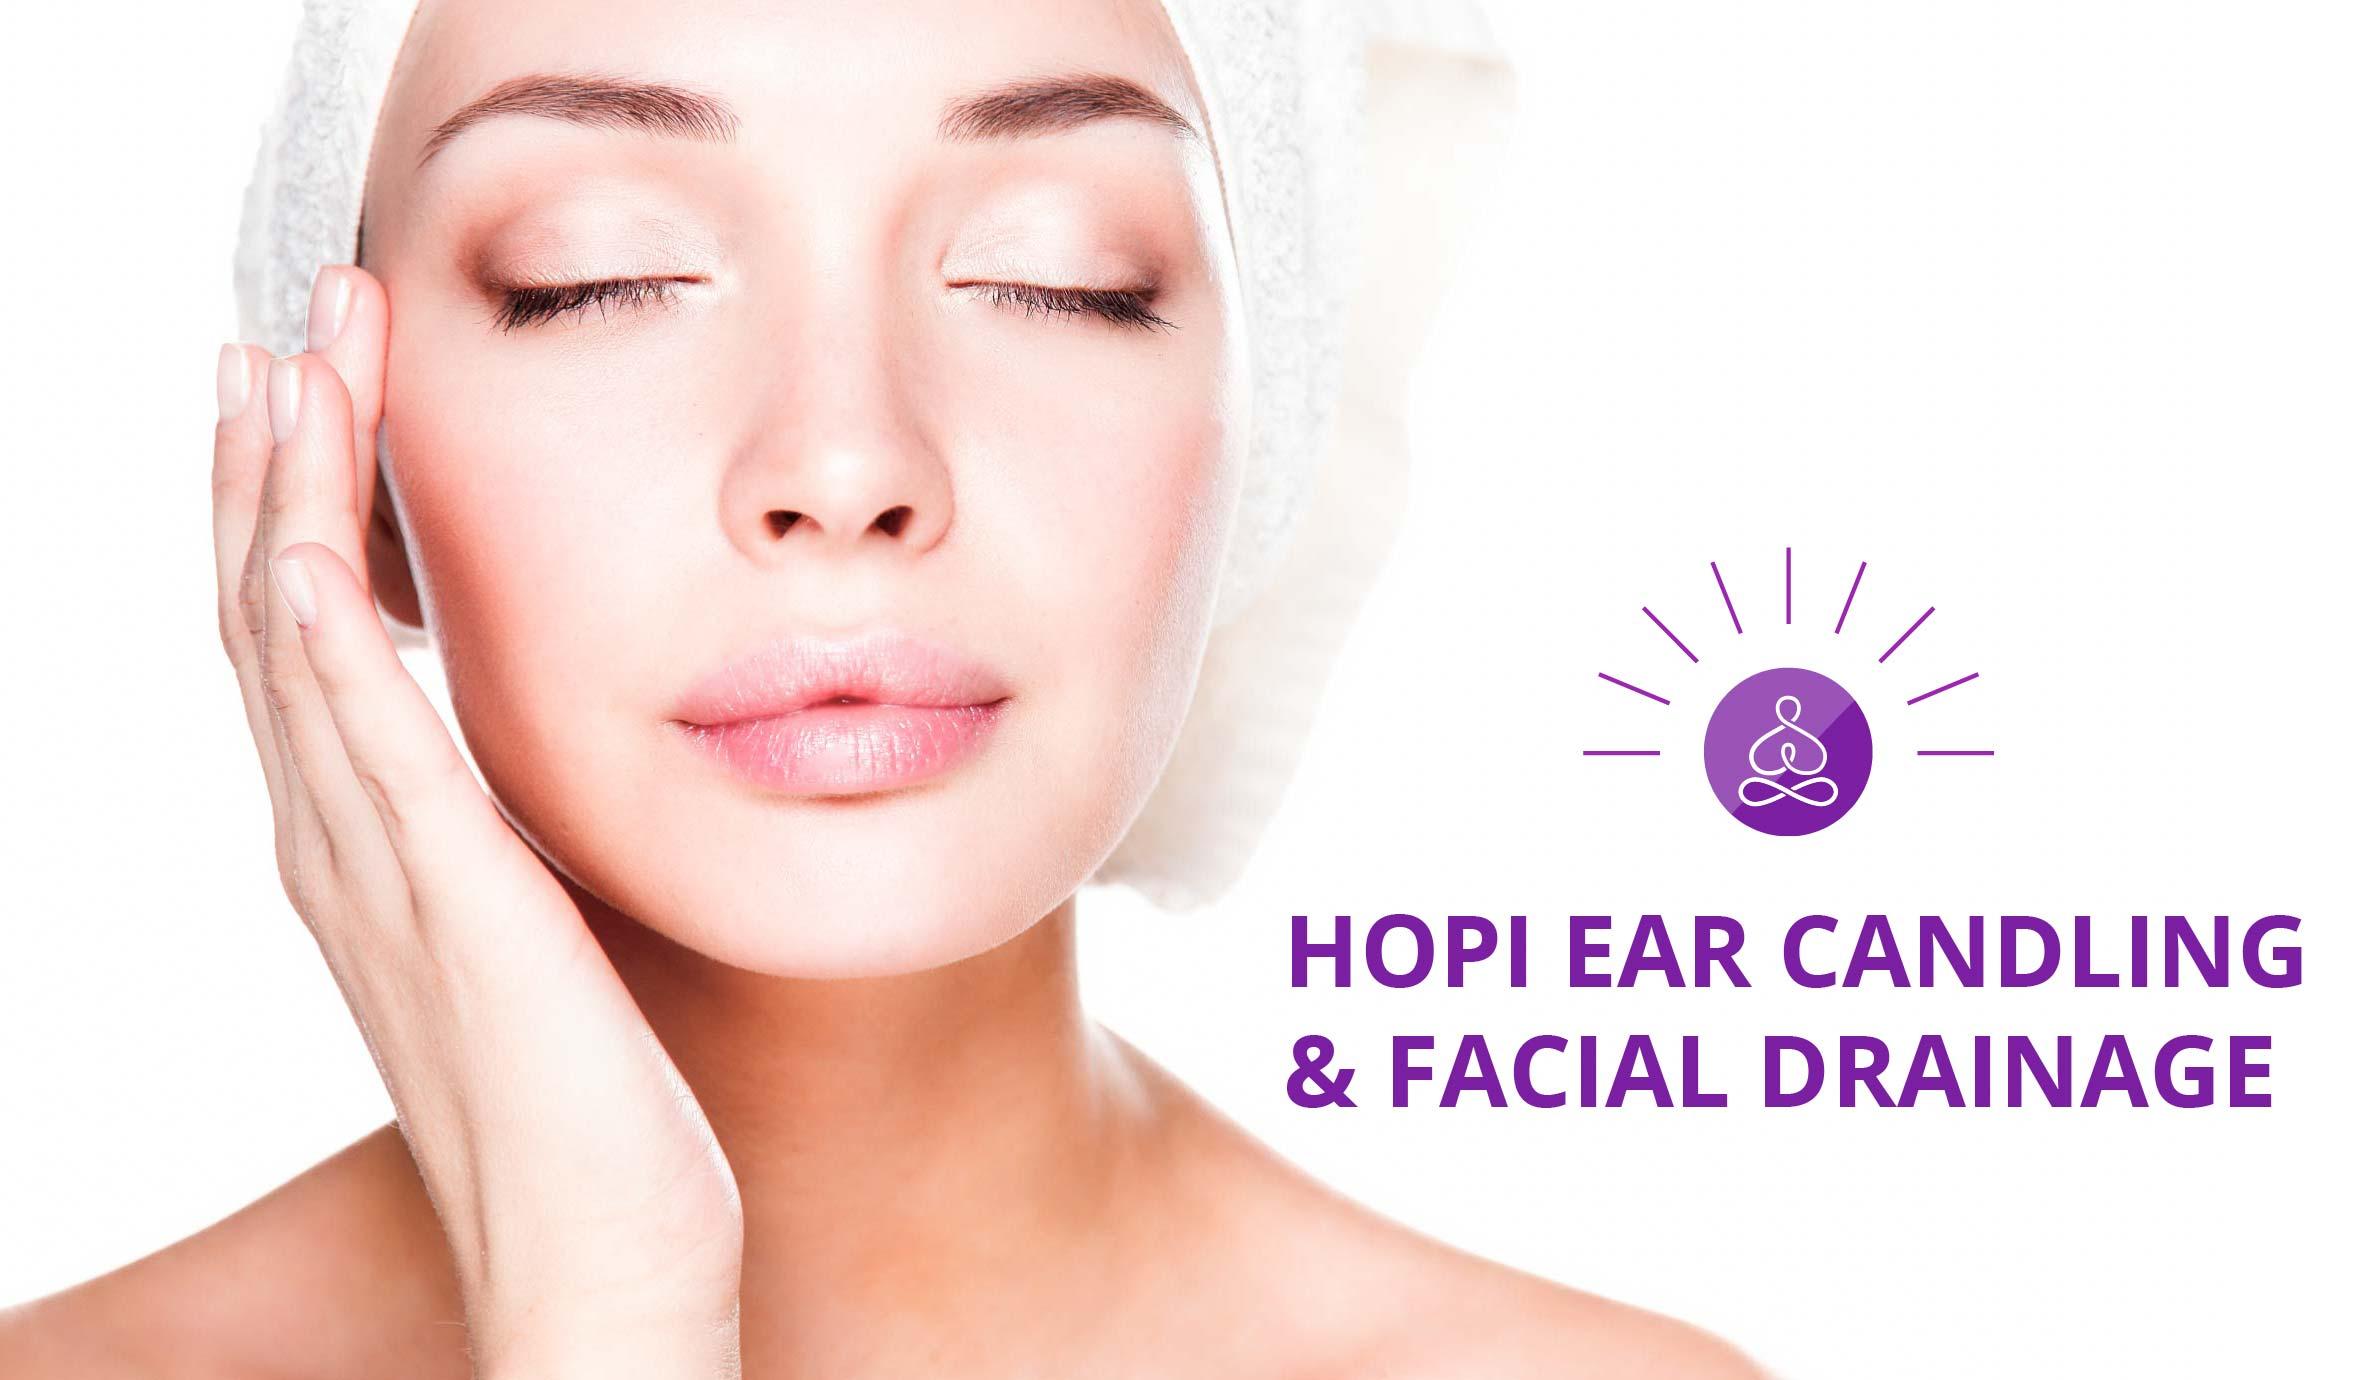 HOPI EAR CANDLING & FACIAL DRAINAGE